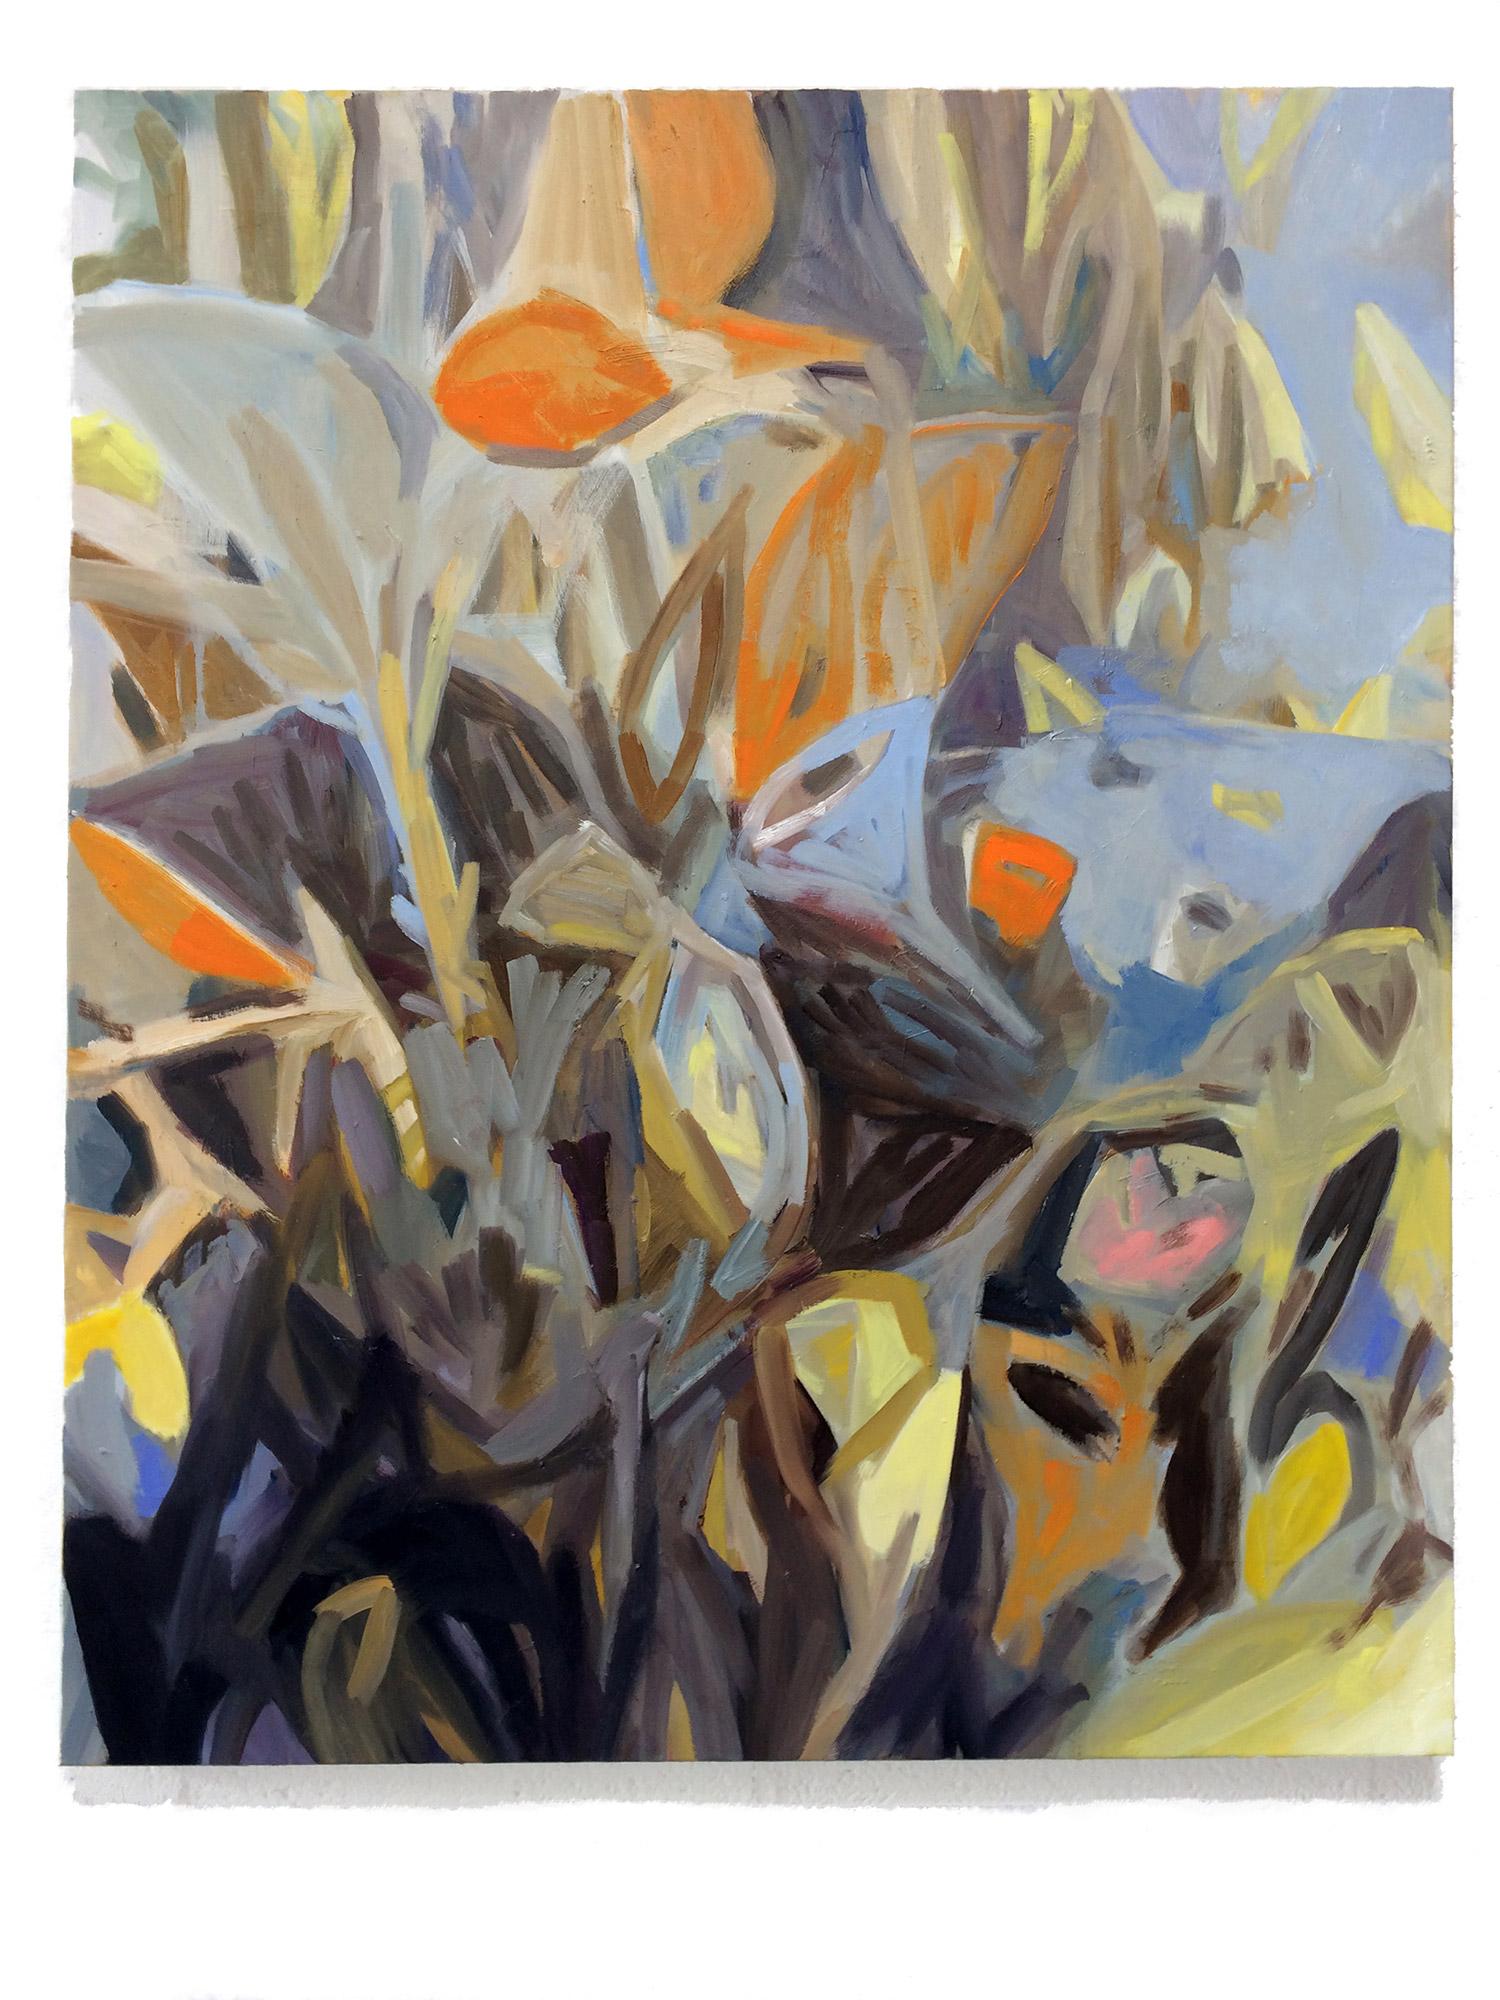 GROW, olieverf op canvas 100 x 120 cm 2021